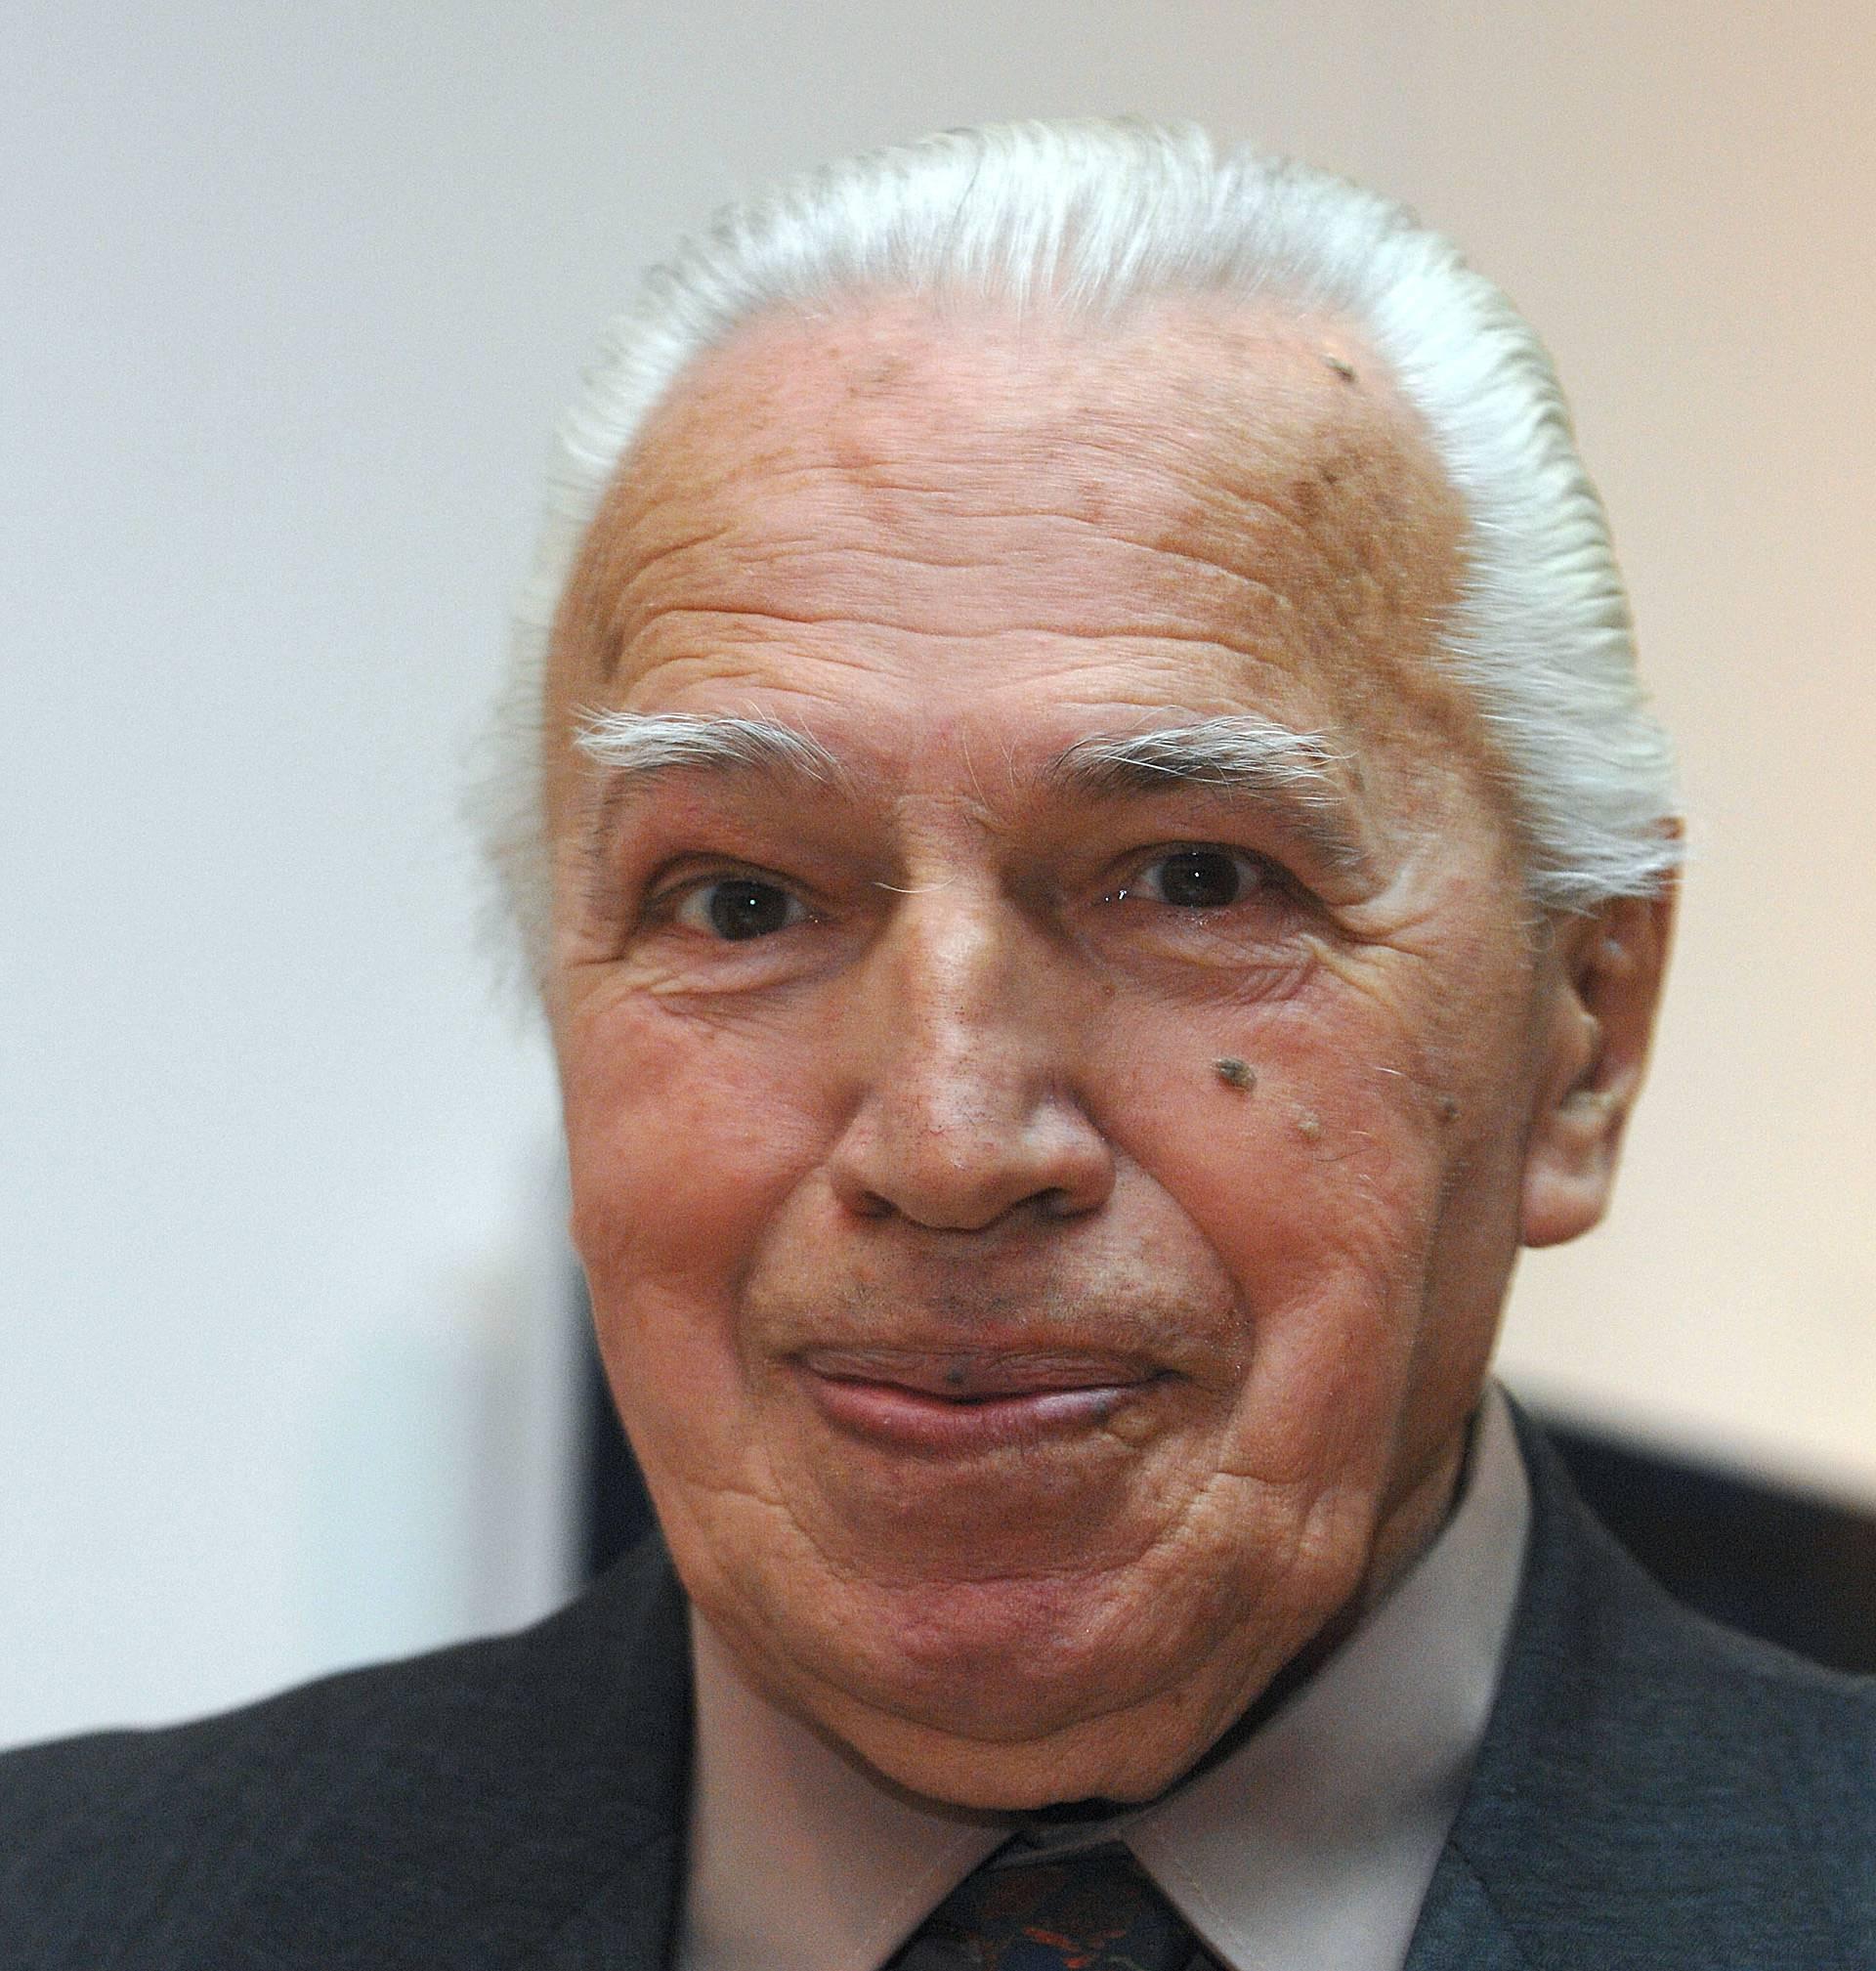 Preminuo legendarni novinar Zvonimir Magdić - Amigo